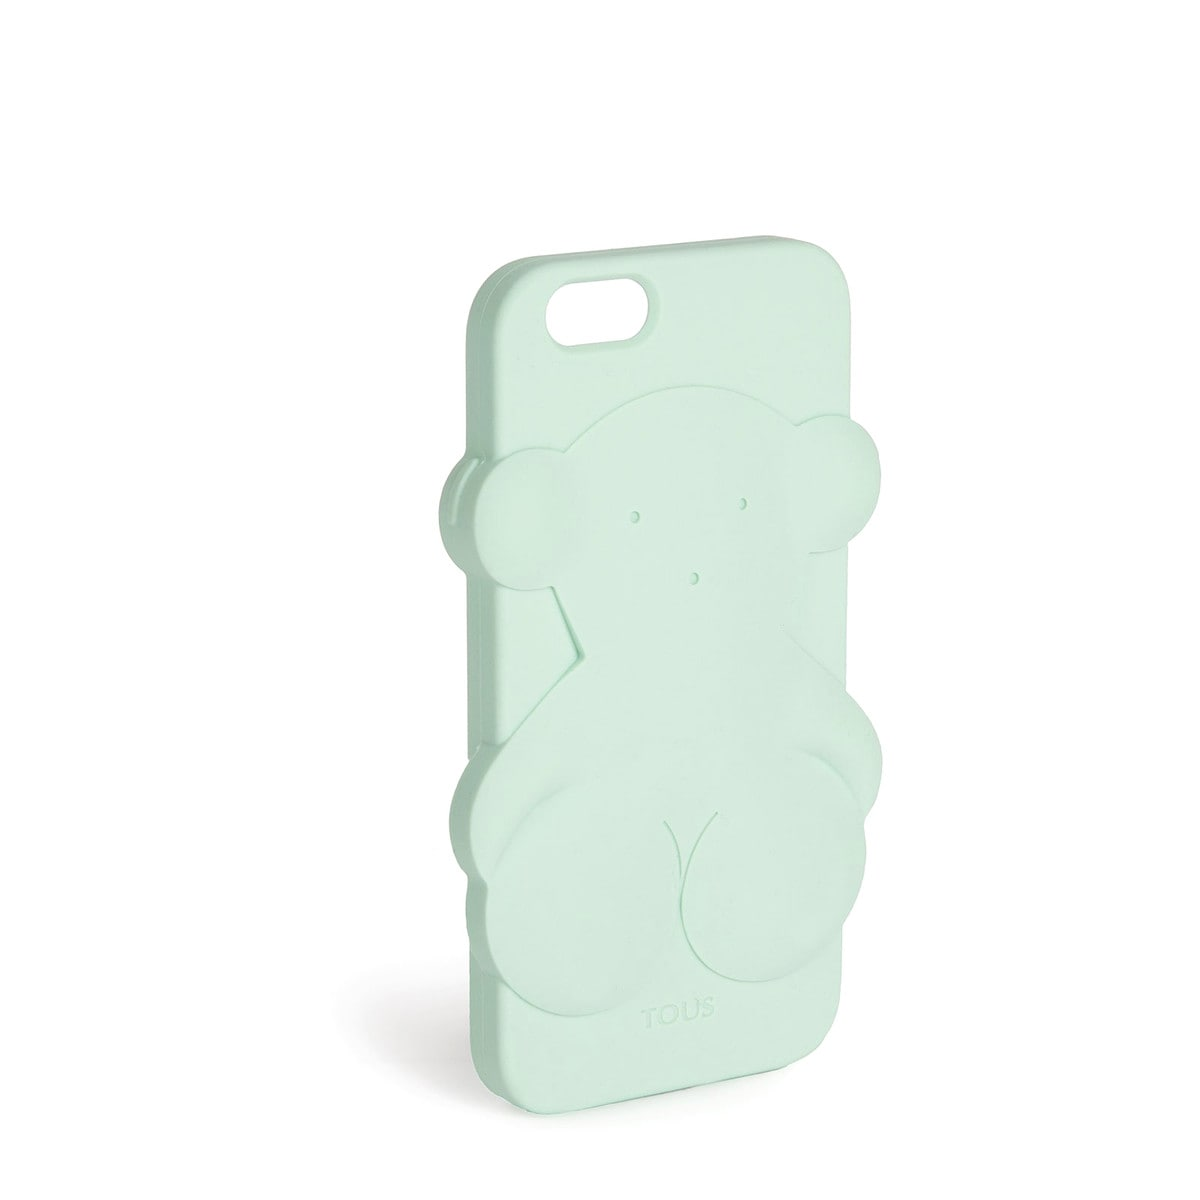 En 6 Bear De Web Iphone Tous Móvil Verde Color Funda Rubber Sitio tQCdhrsx